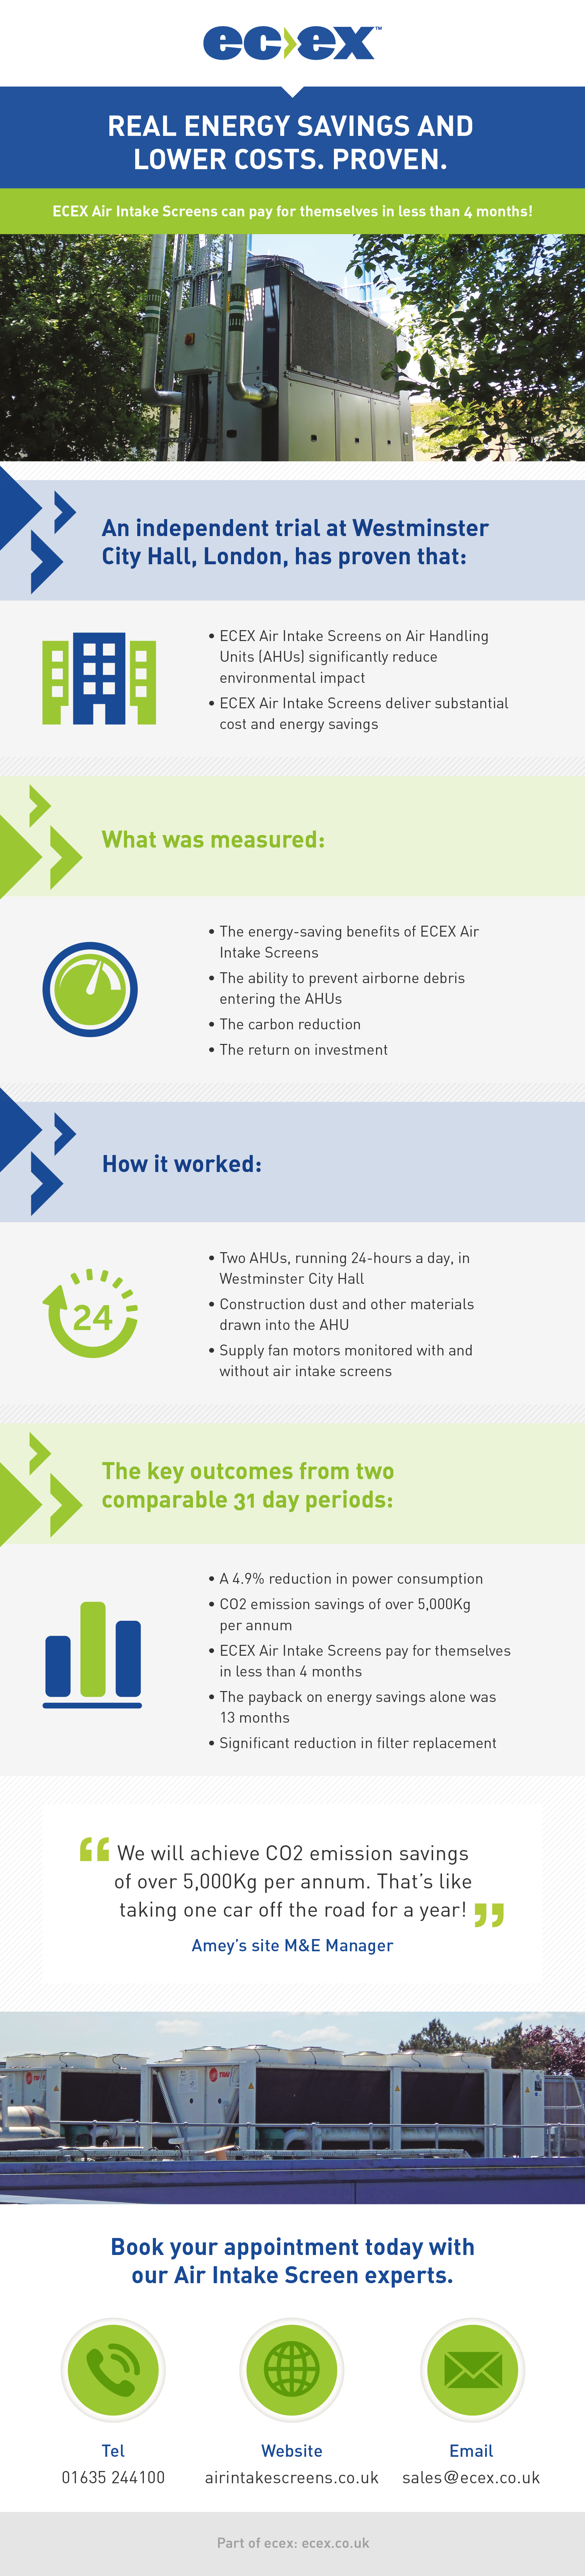 Ecex infographic_update-17-12-15